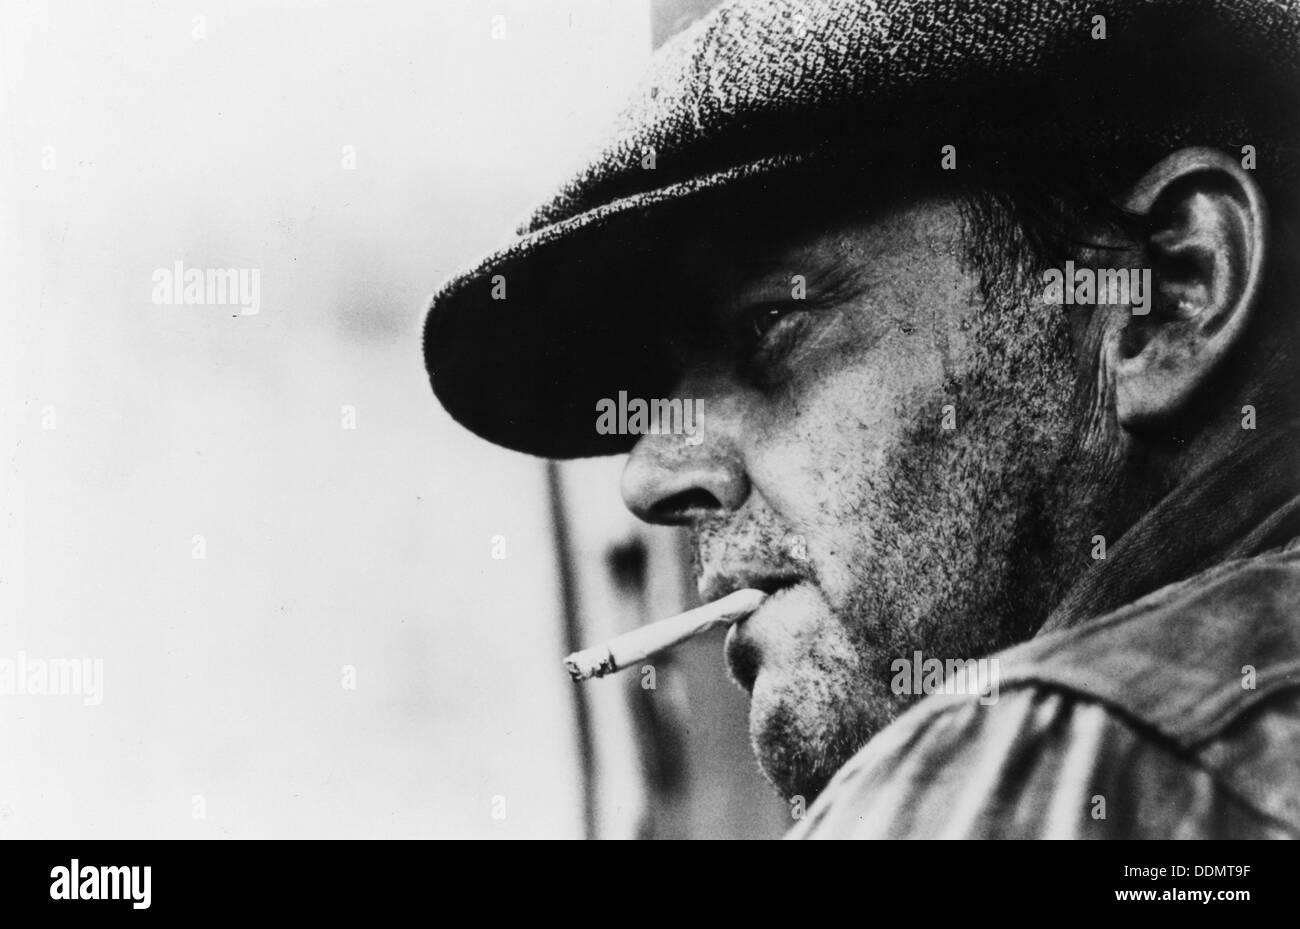 Jack Nicholson (1937- ), American actor, 1975. - Stock Image